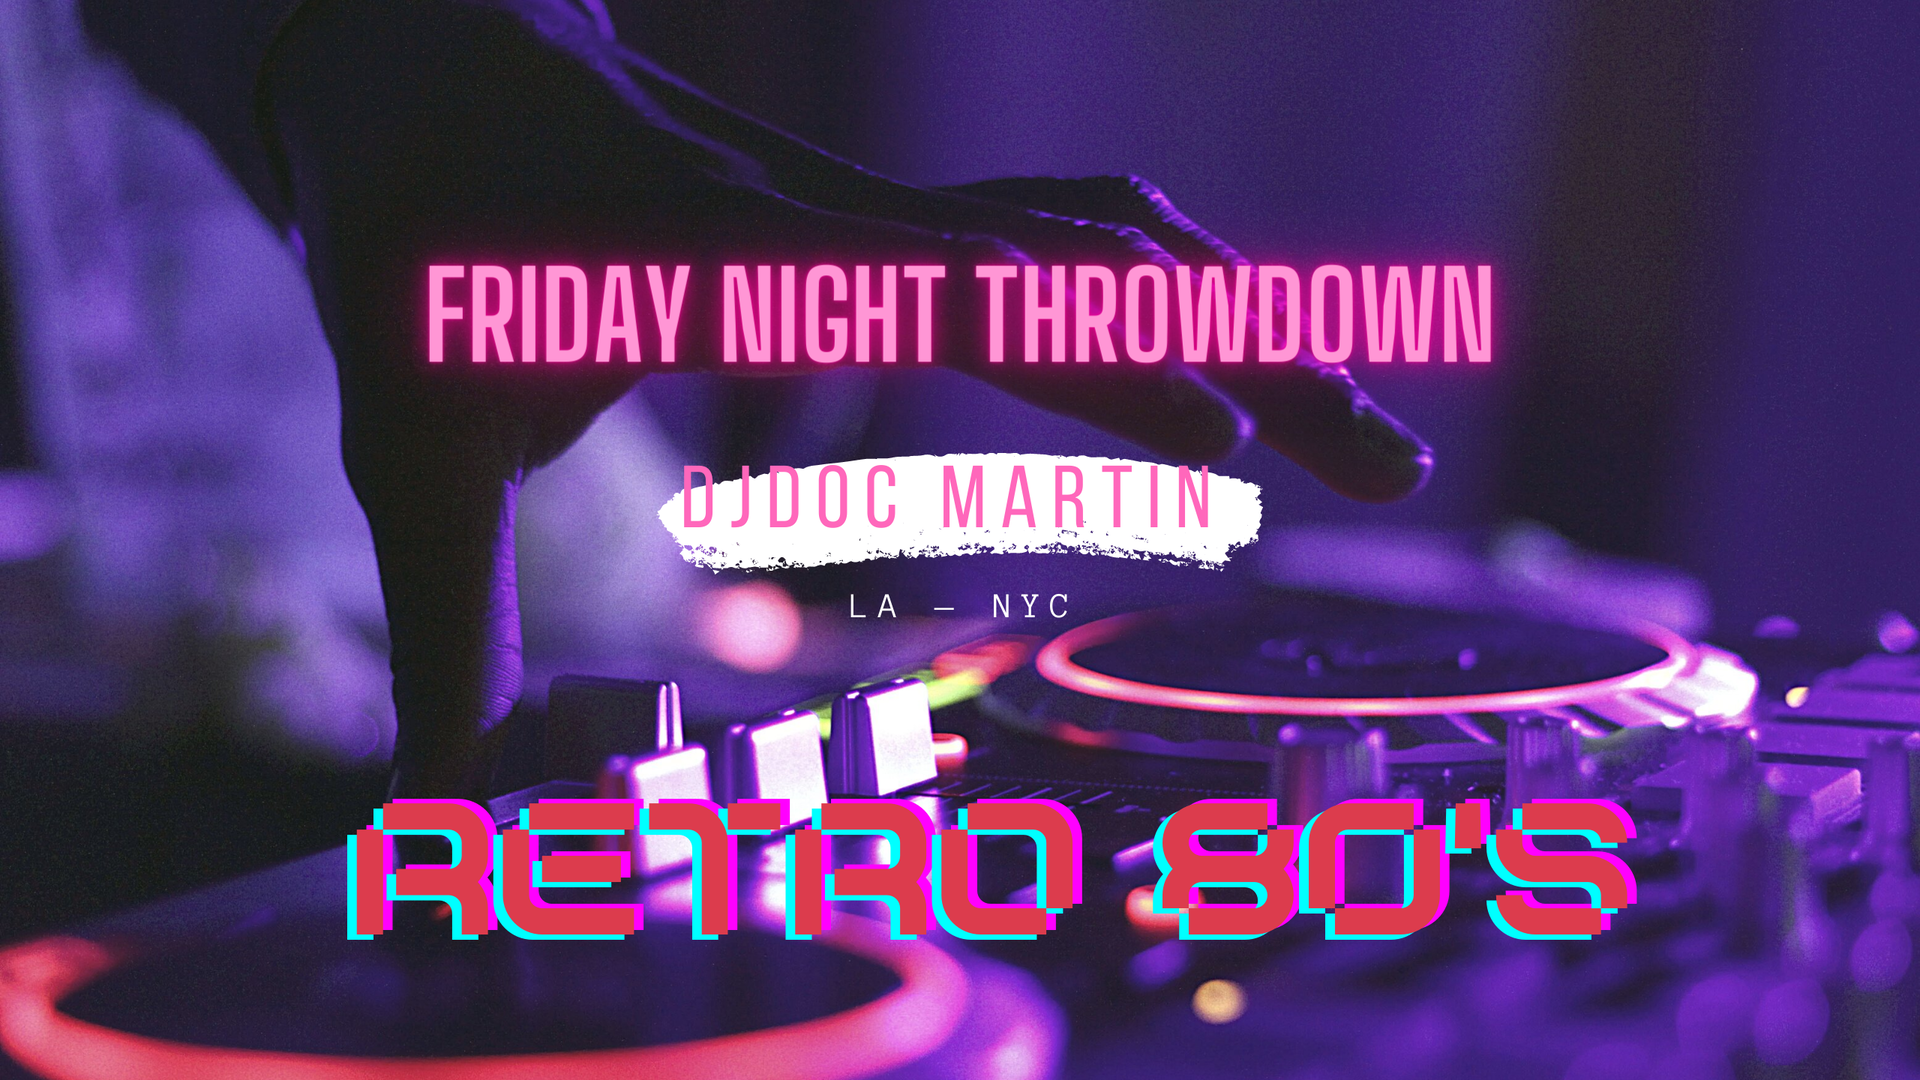 Grab Your Skates   The 80's Skating Mix - Friday Night Throwdown